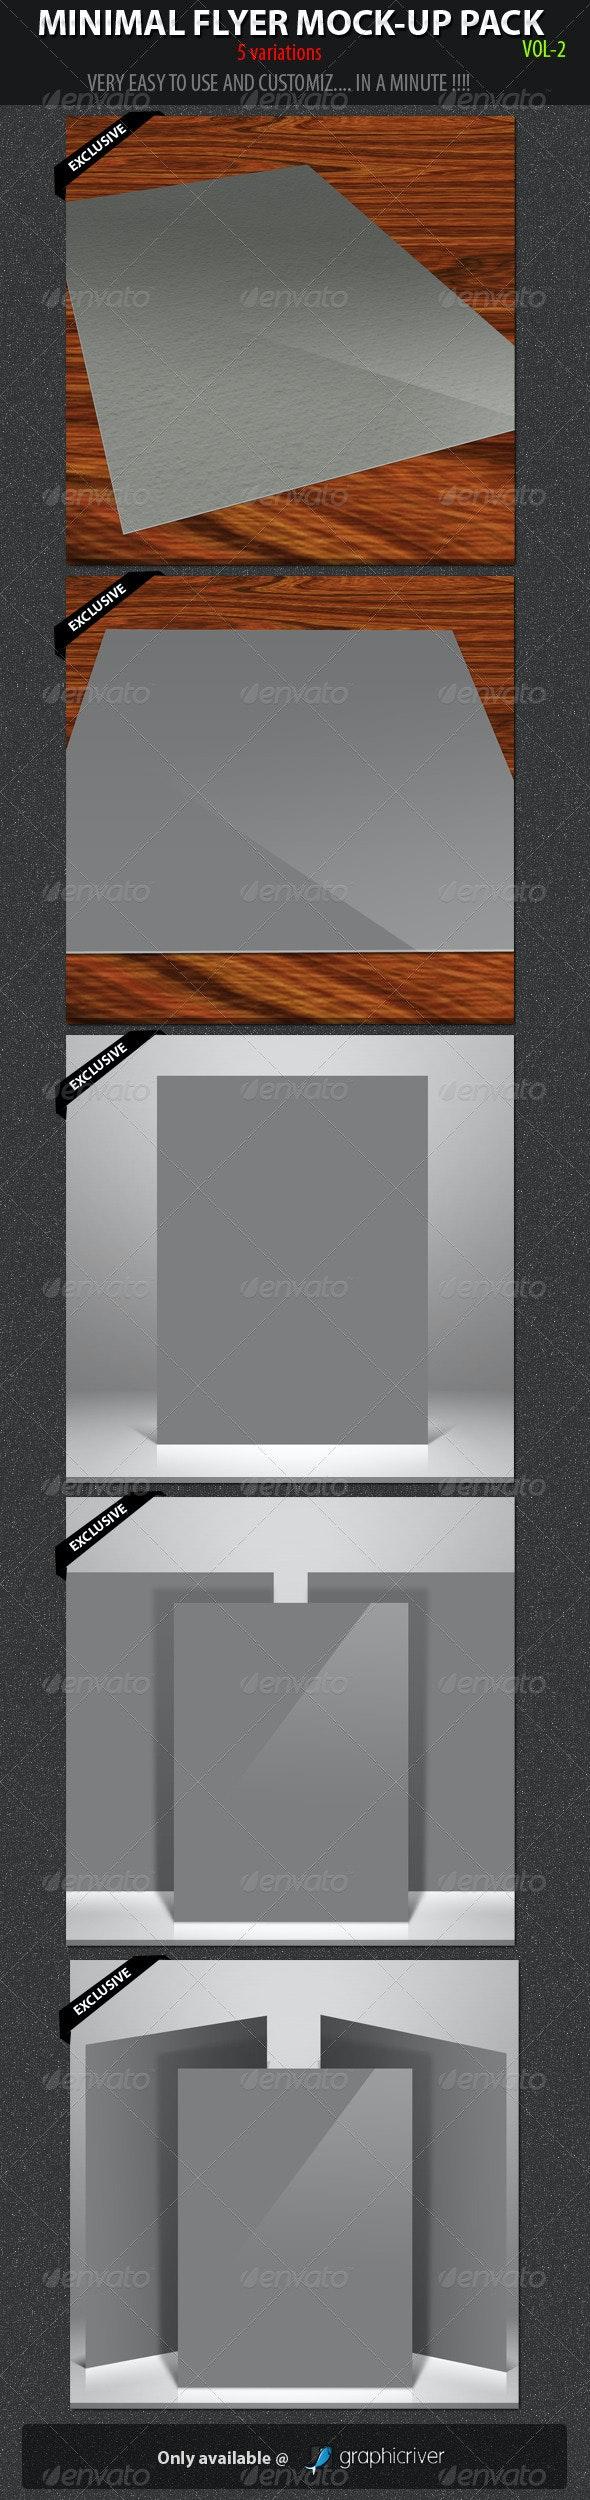 Minimal Flyer Mock-up Pack vol-2 - Flyers Print